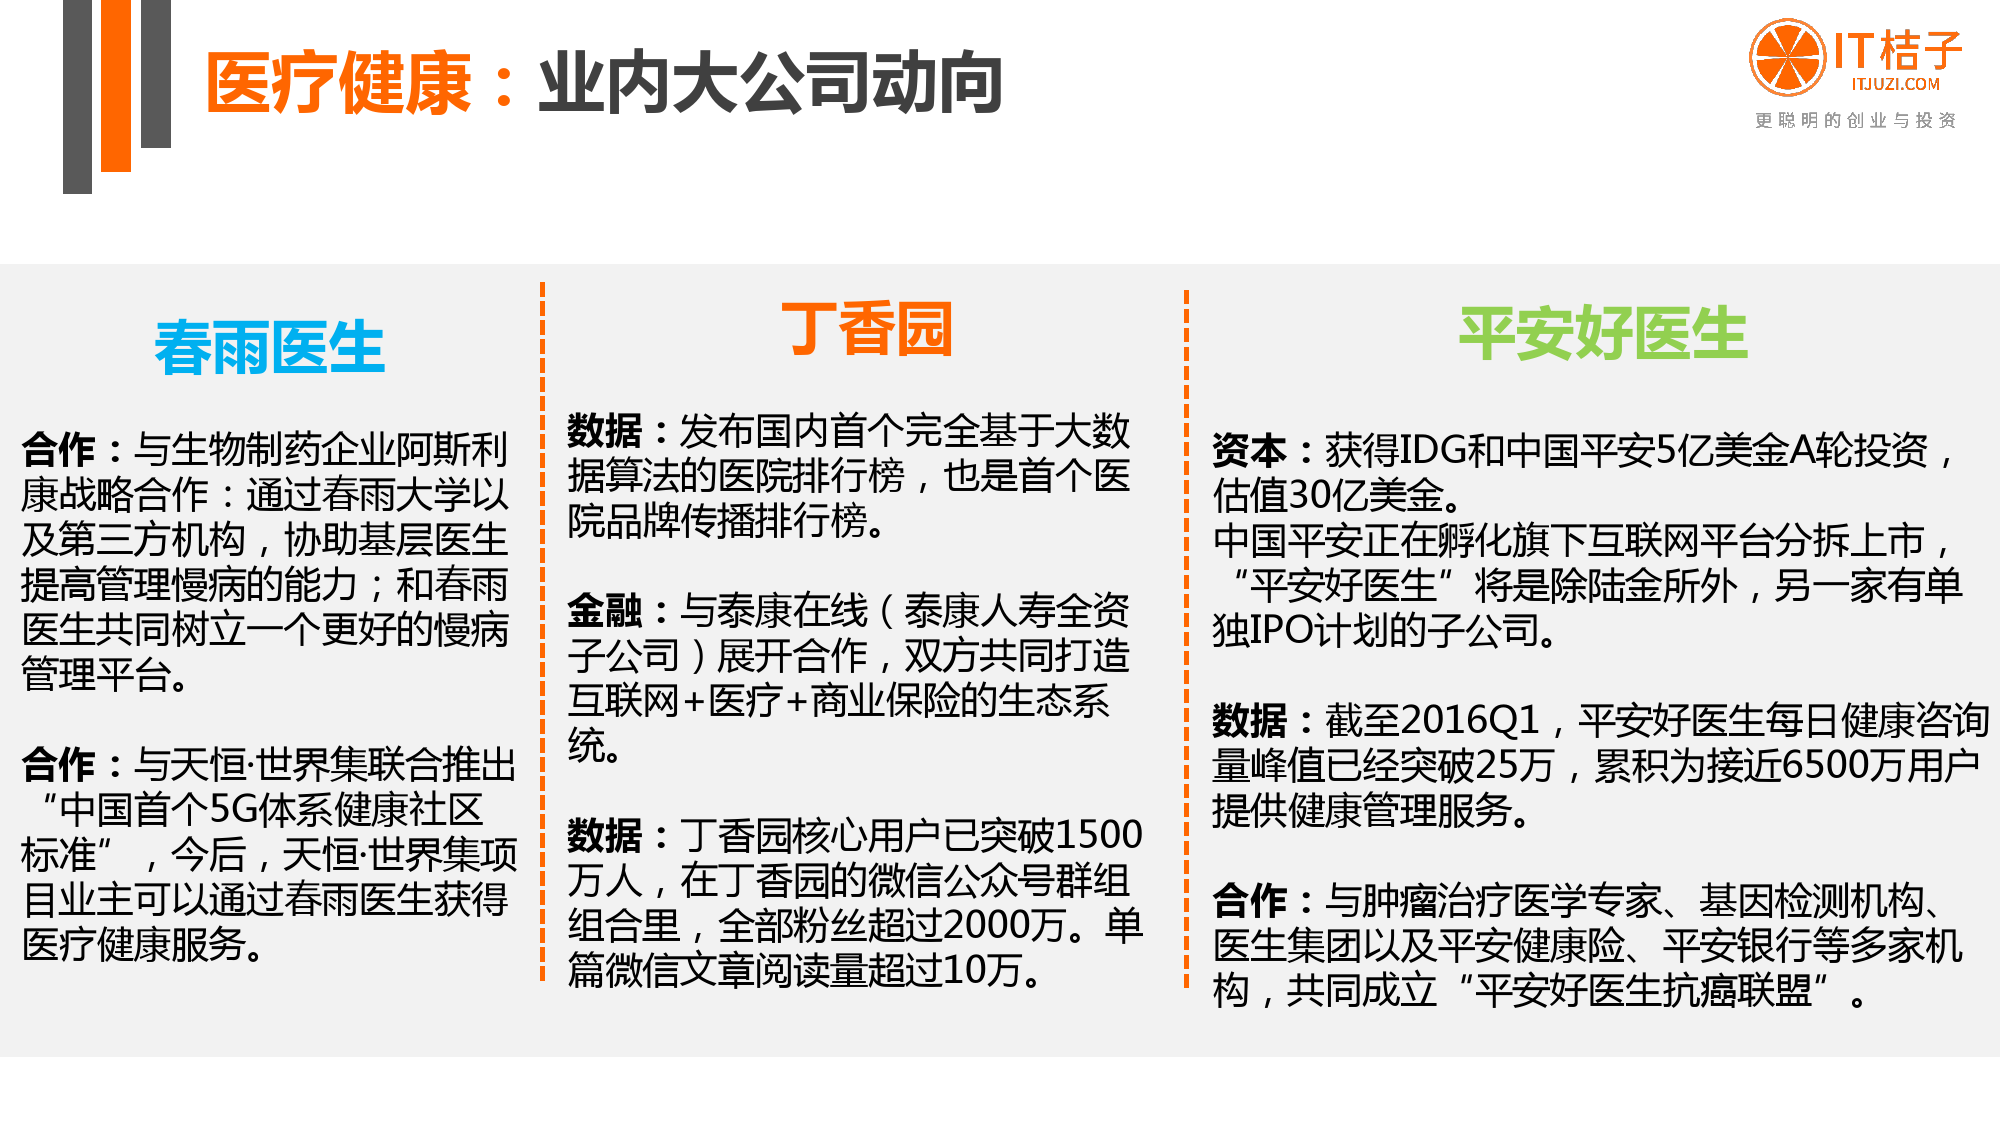 【IT桔子】2016年Q2中国互联网创业投资分析报告_000043